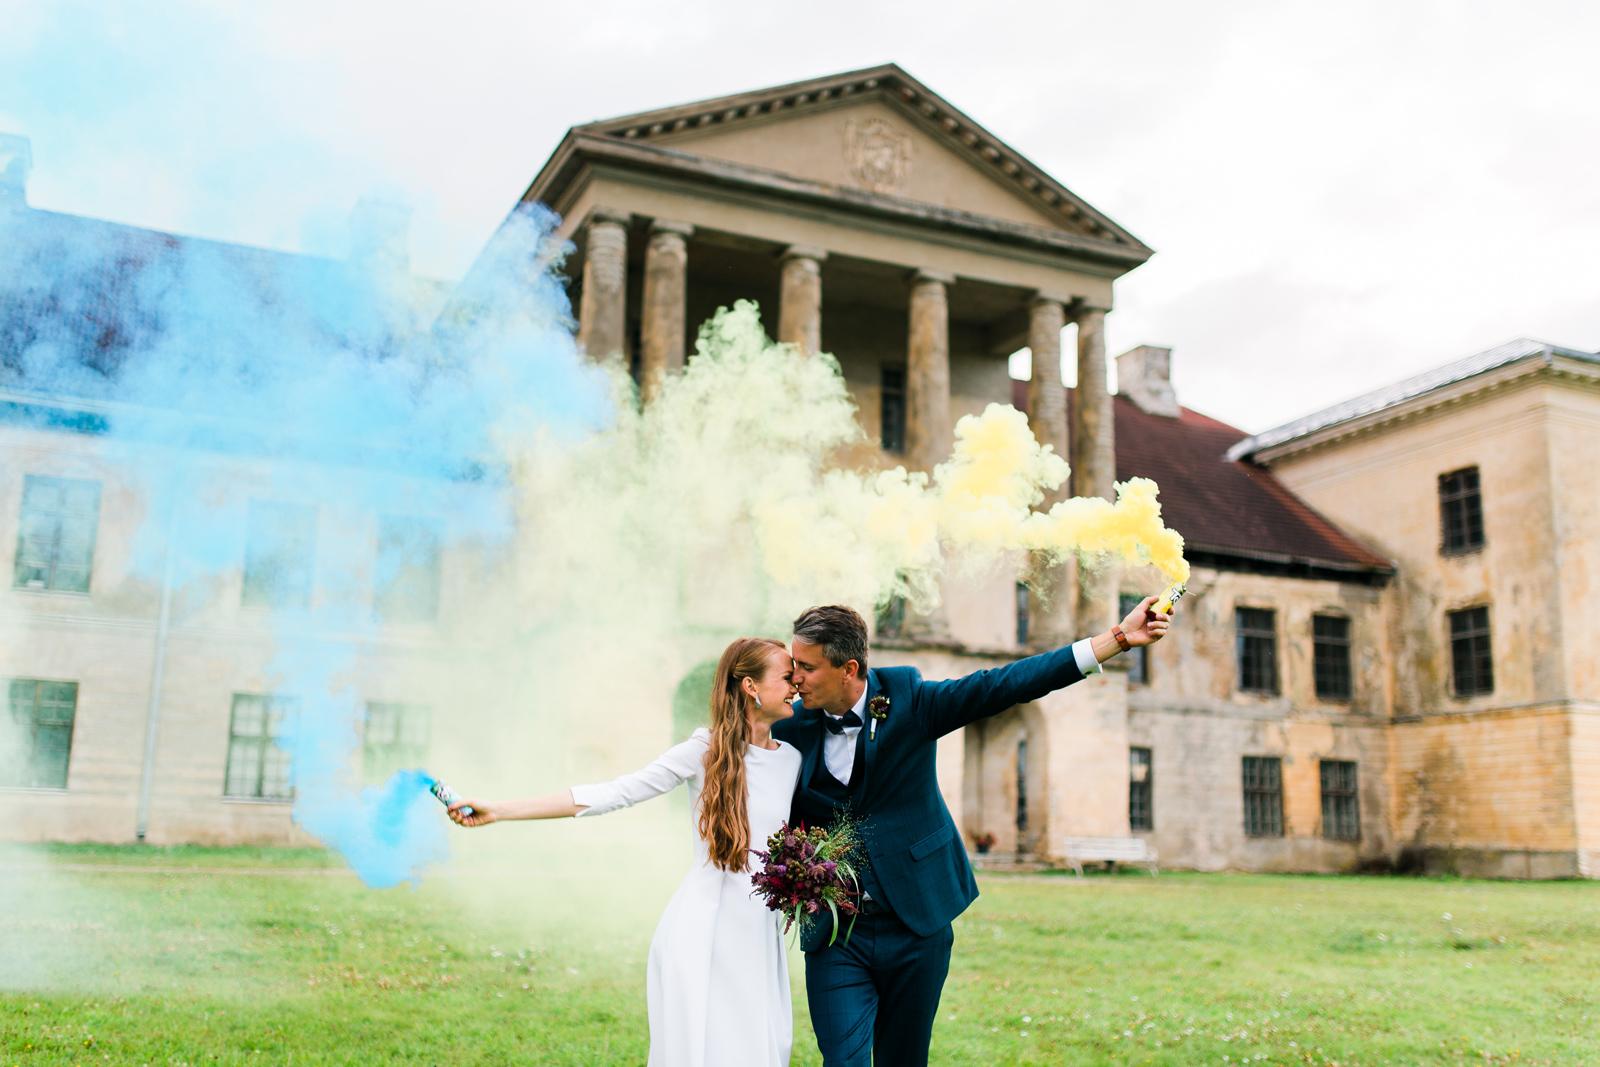 Kolga_manor_mois_pulm_wedding_diane_heigo_mait_juriado